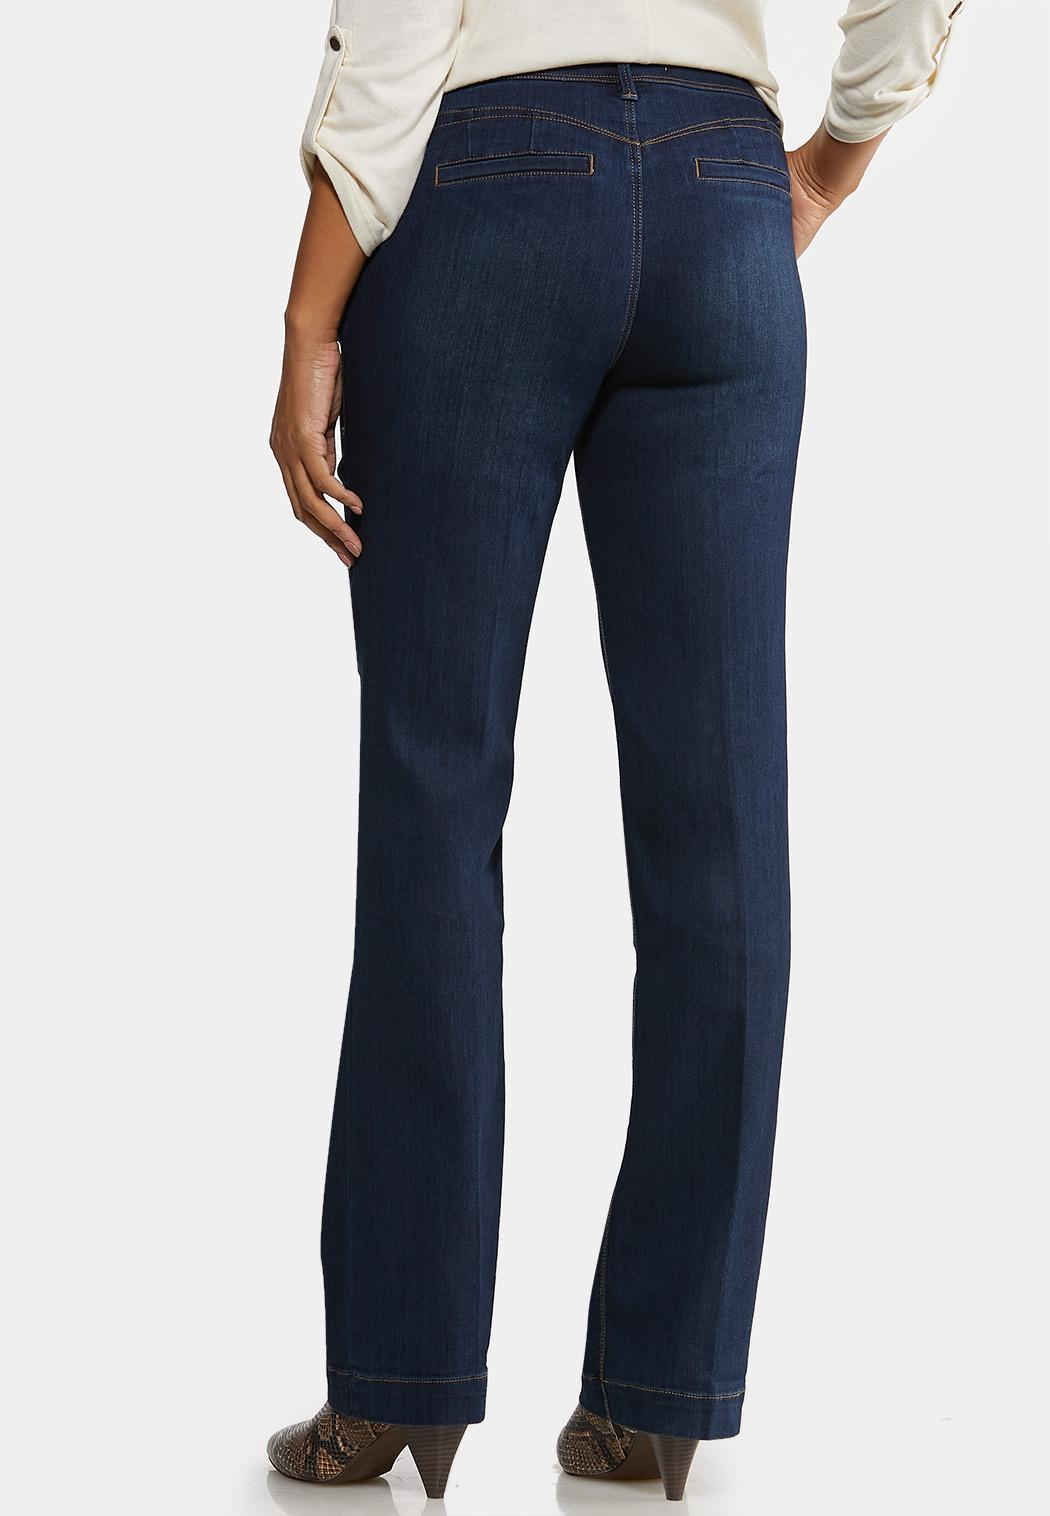 Dark Wash Bootcut Jeans (Item #44095641)